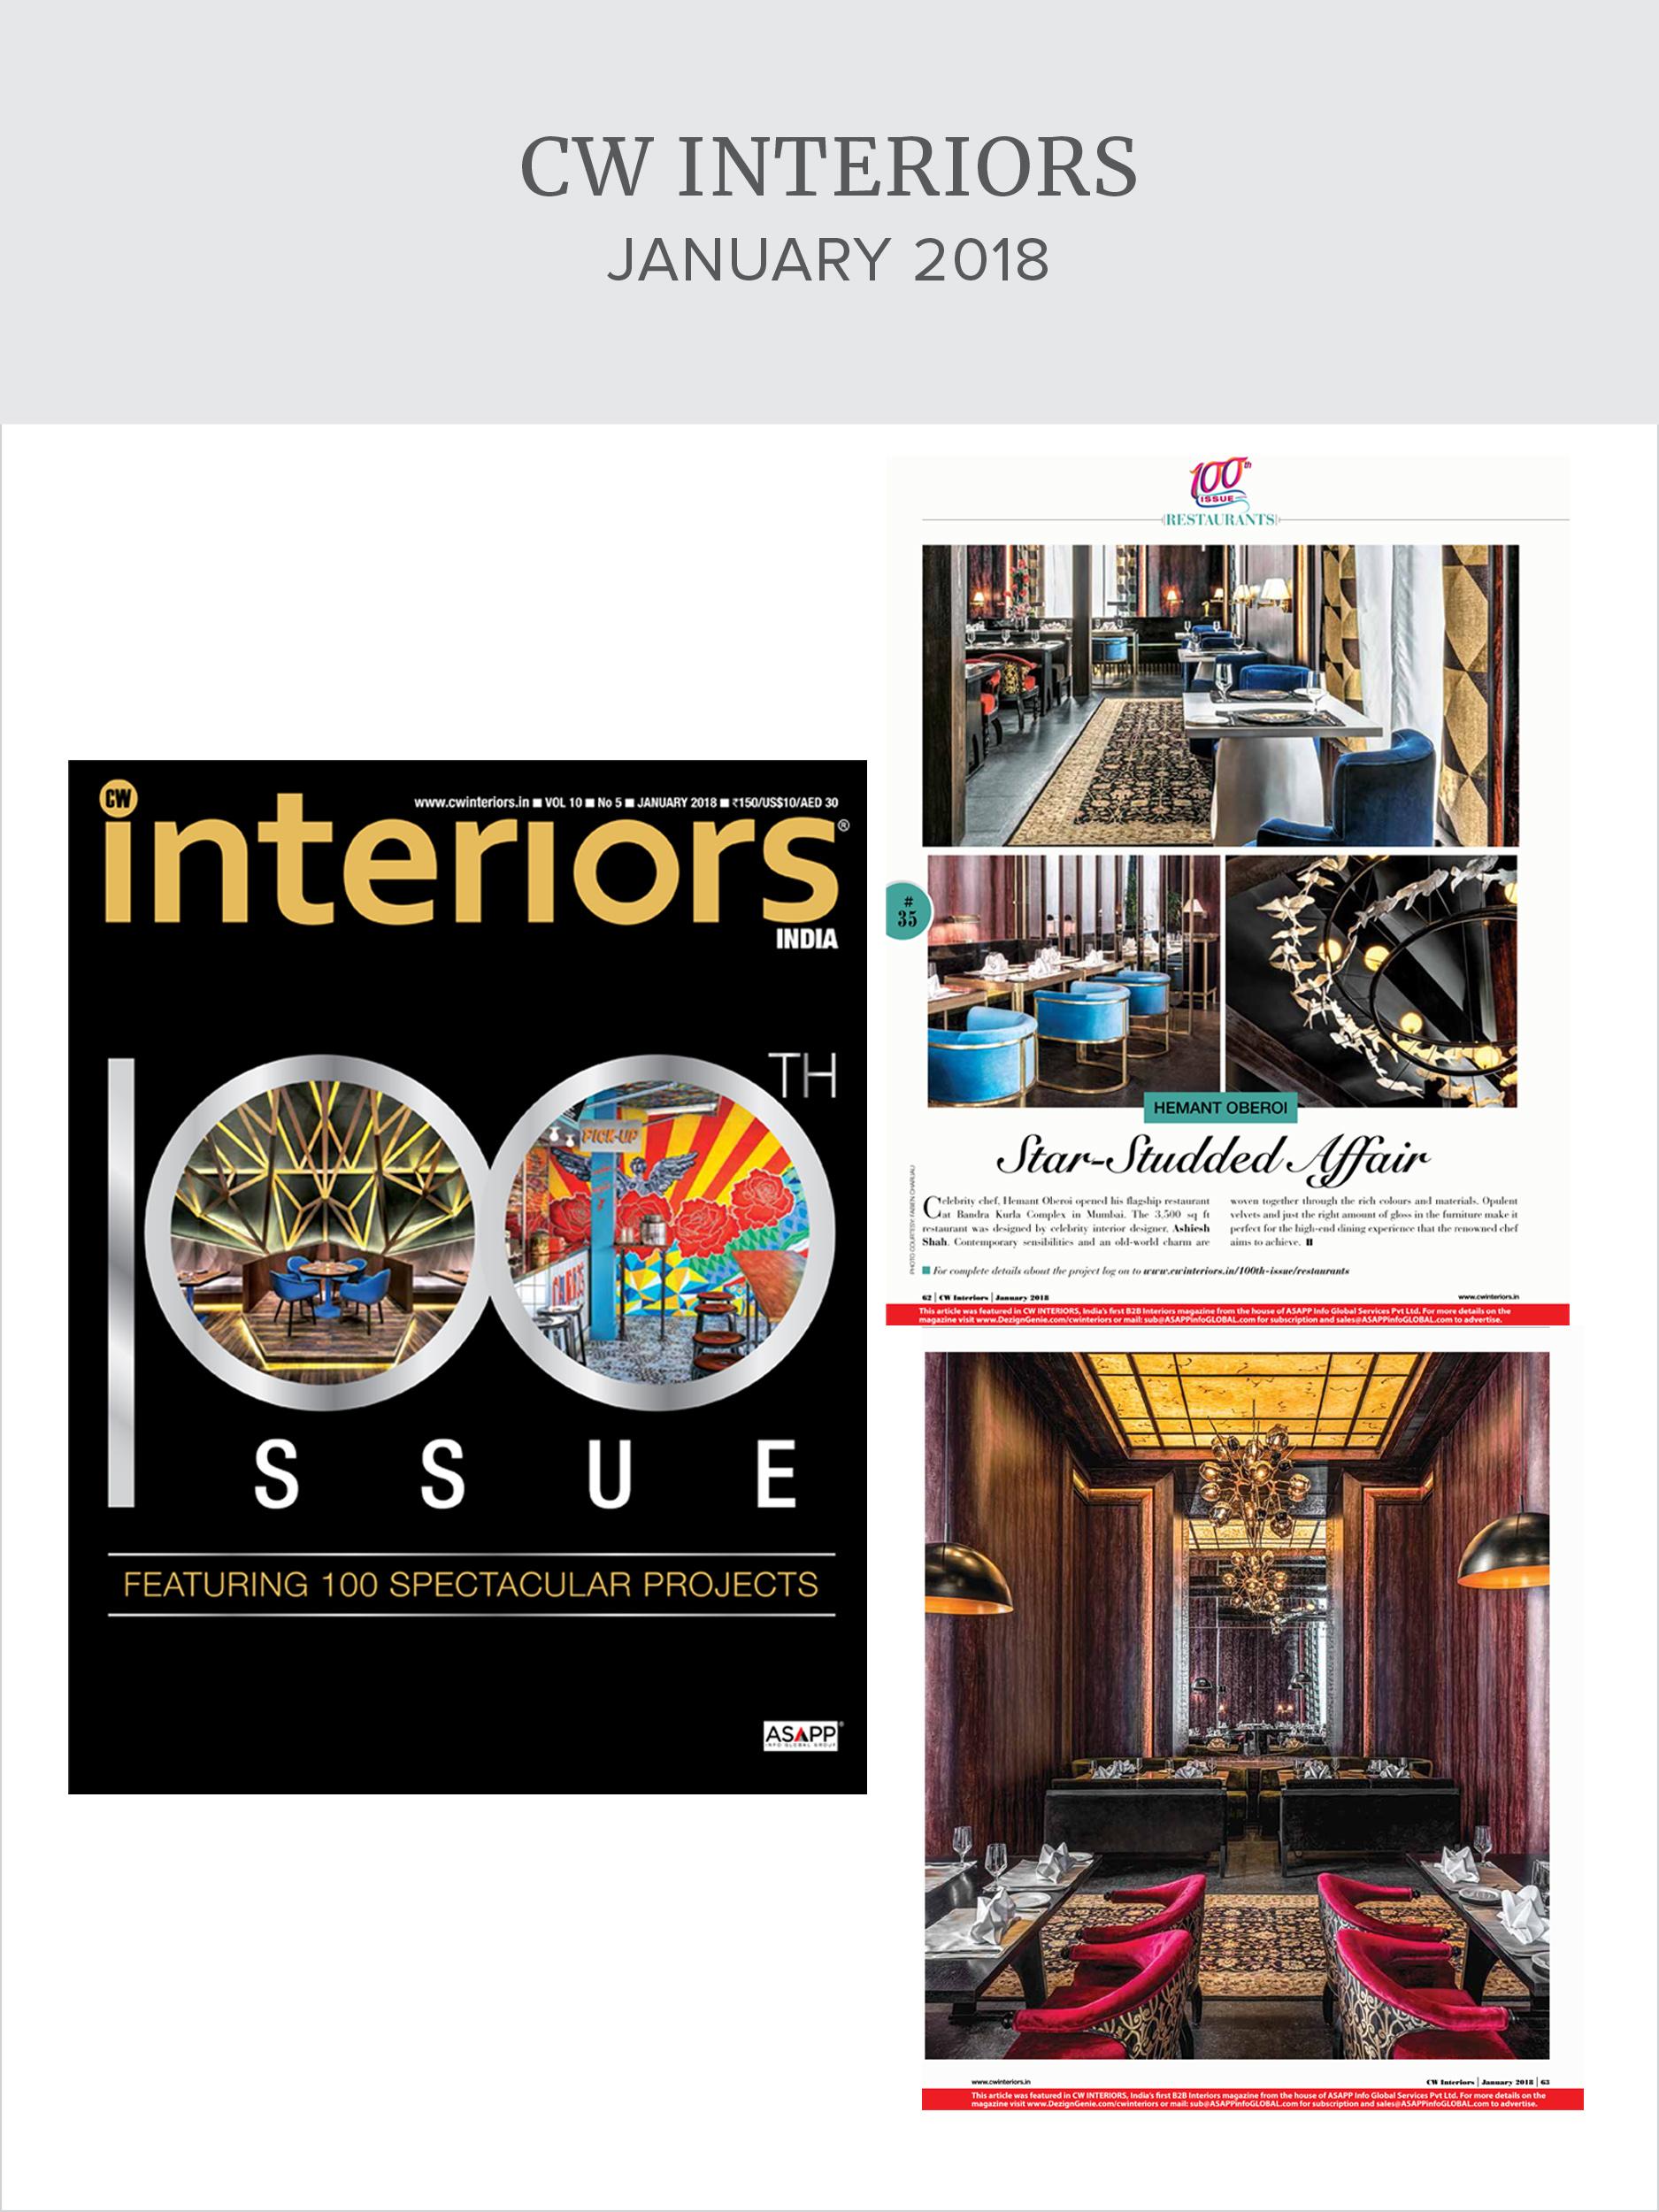 CW interiors 100th issue Jan 2018 Restaurant.jpg